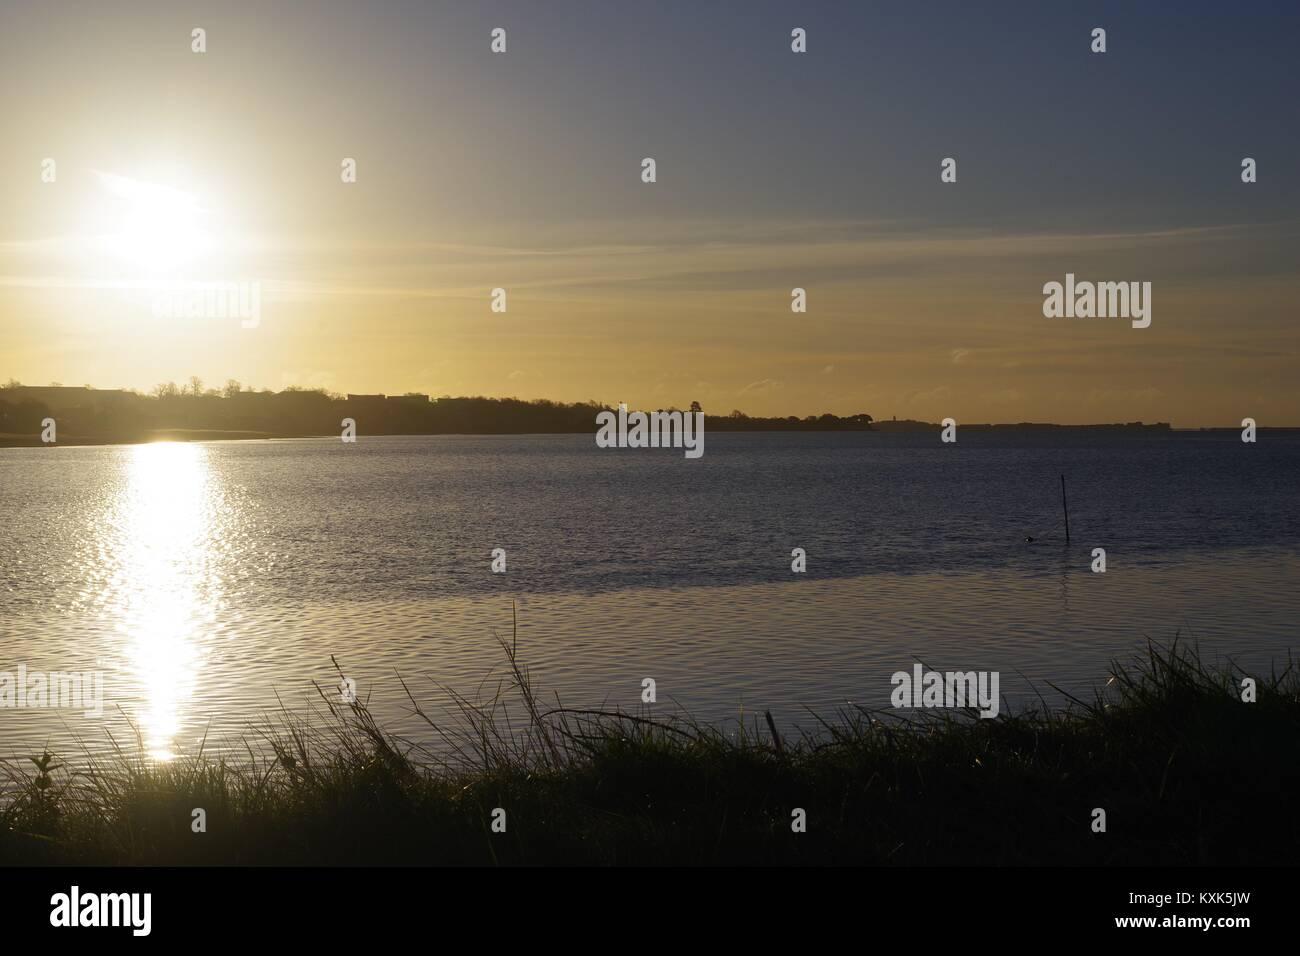 Sunrise over the Exe Estuary at High Tide from Topsham. Devon, UK. January, 2018. Stock Photo